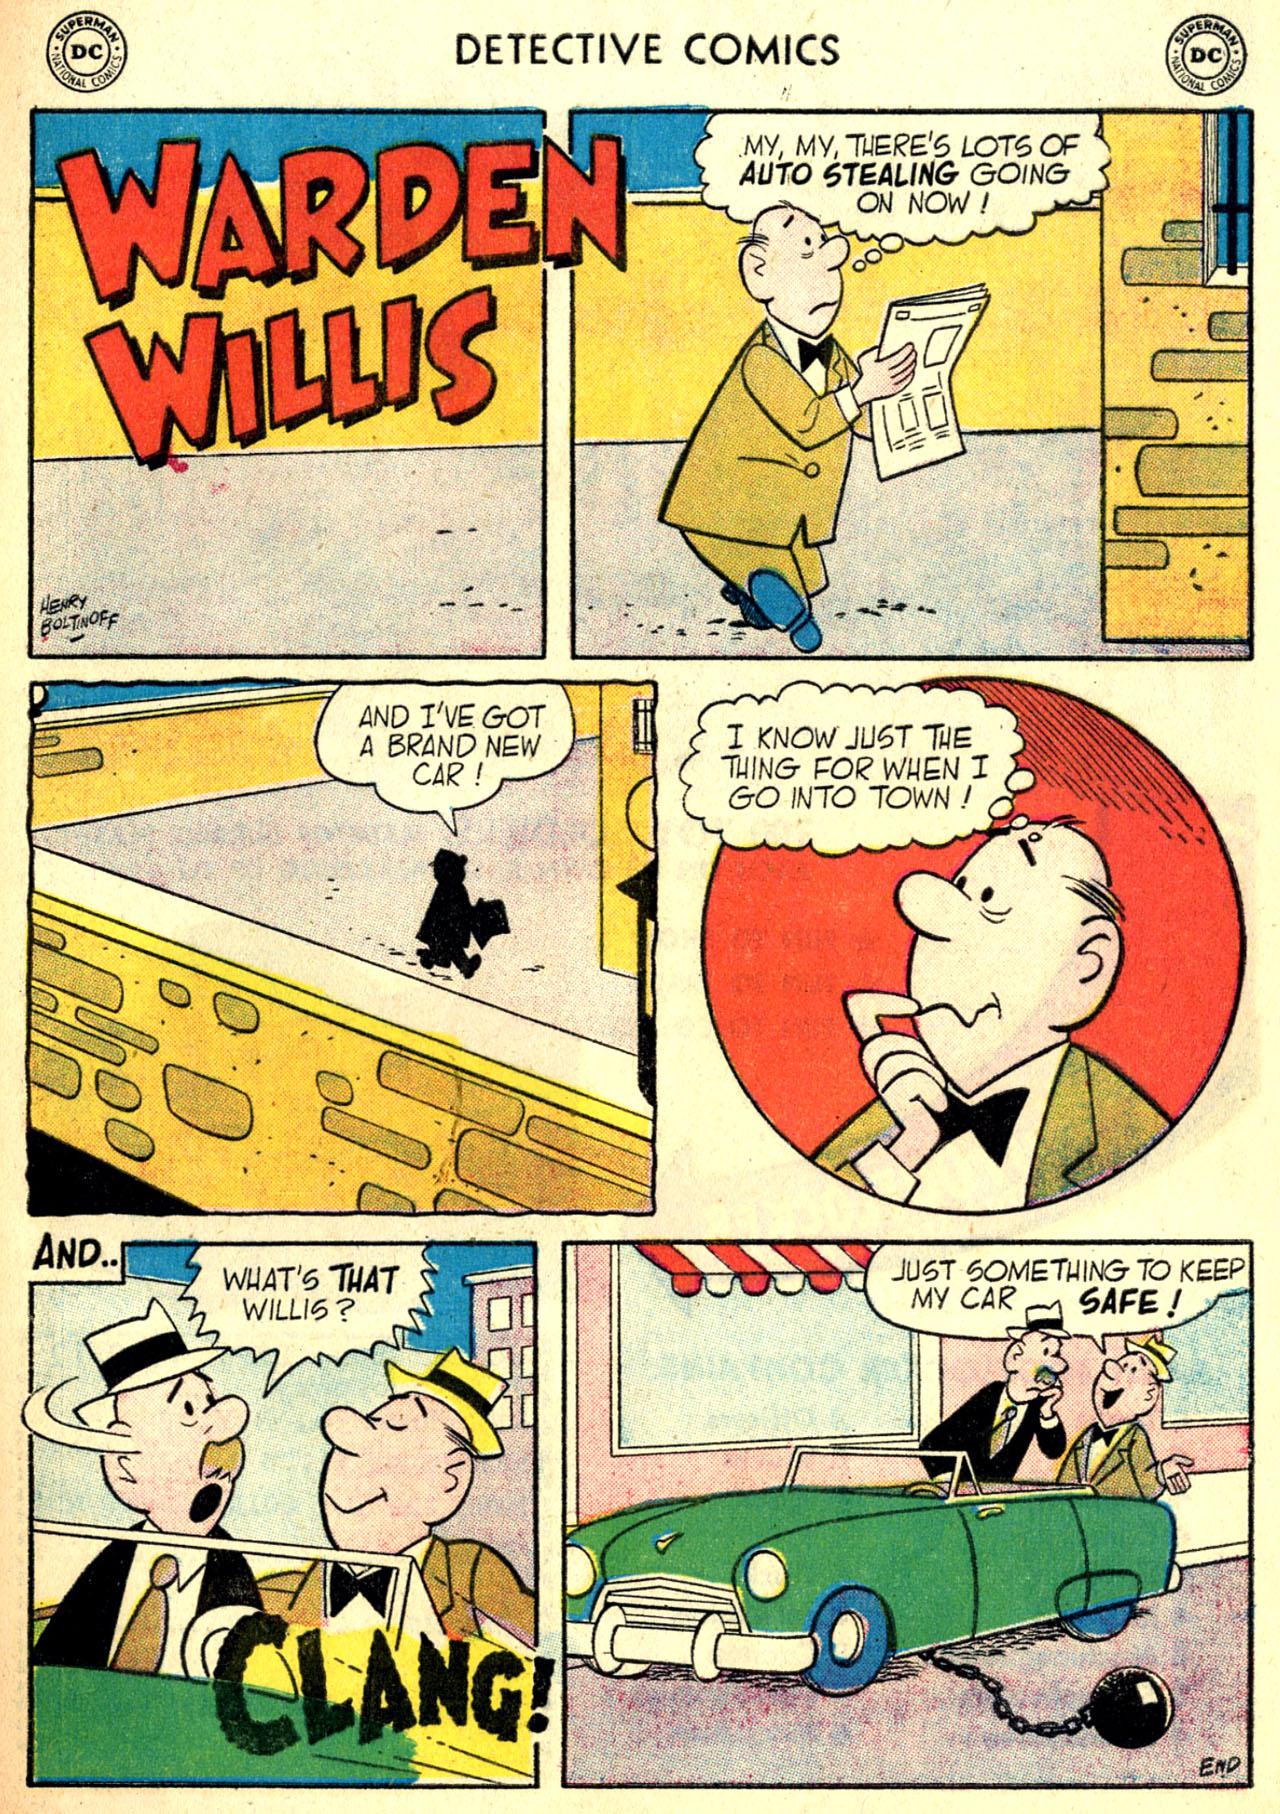 Detective Comics (1937) 240 Page 31